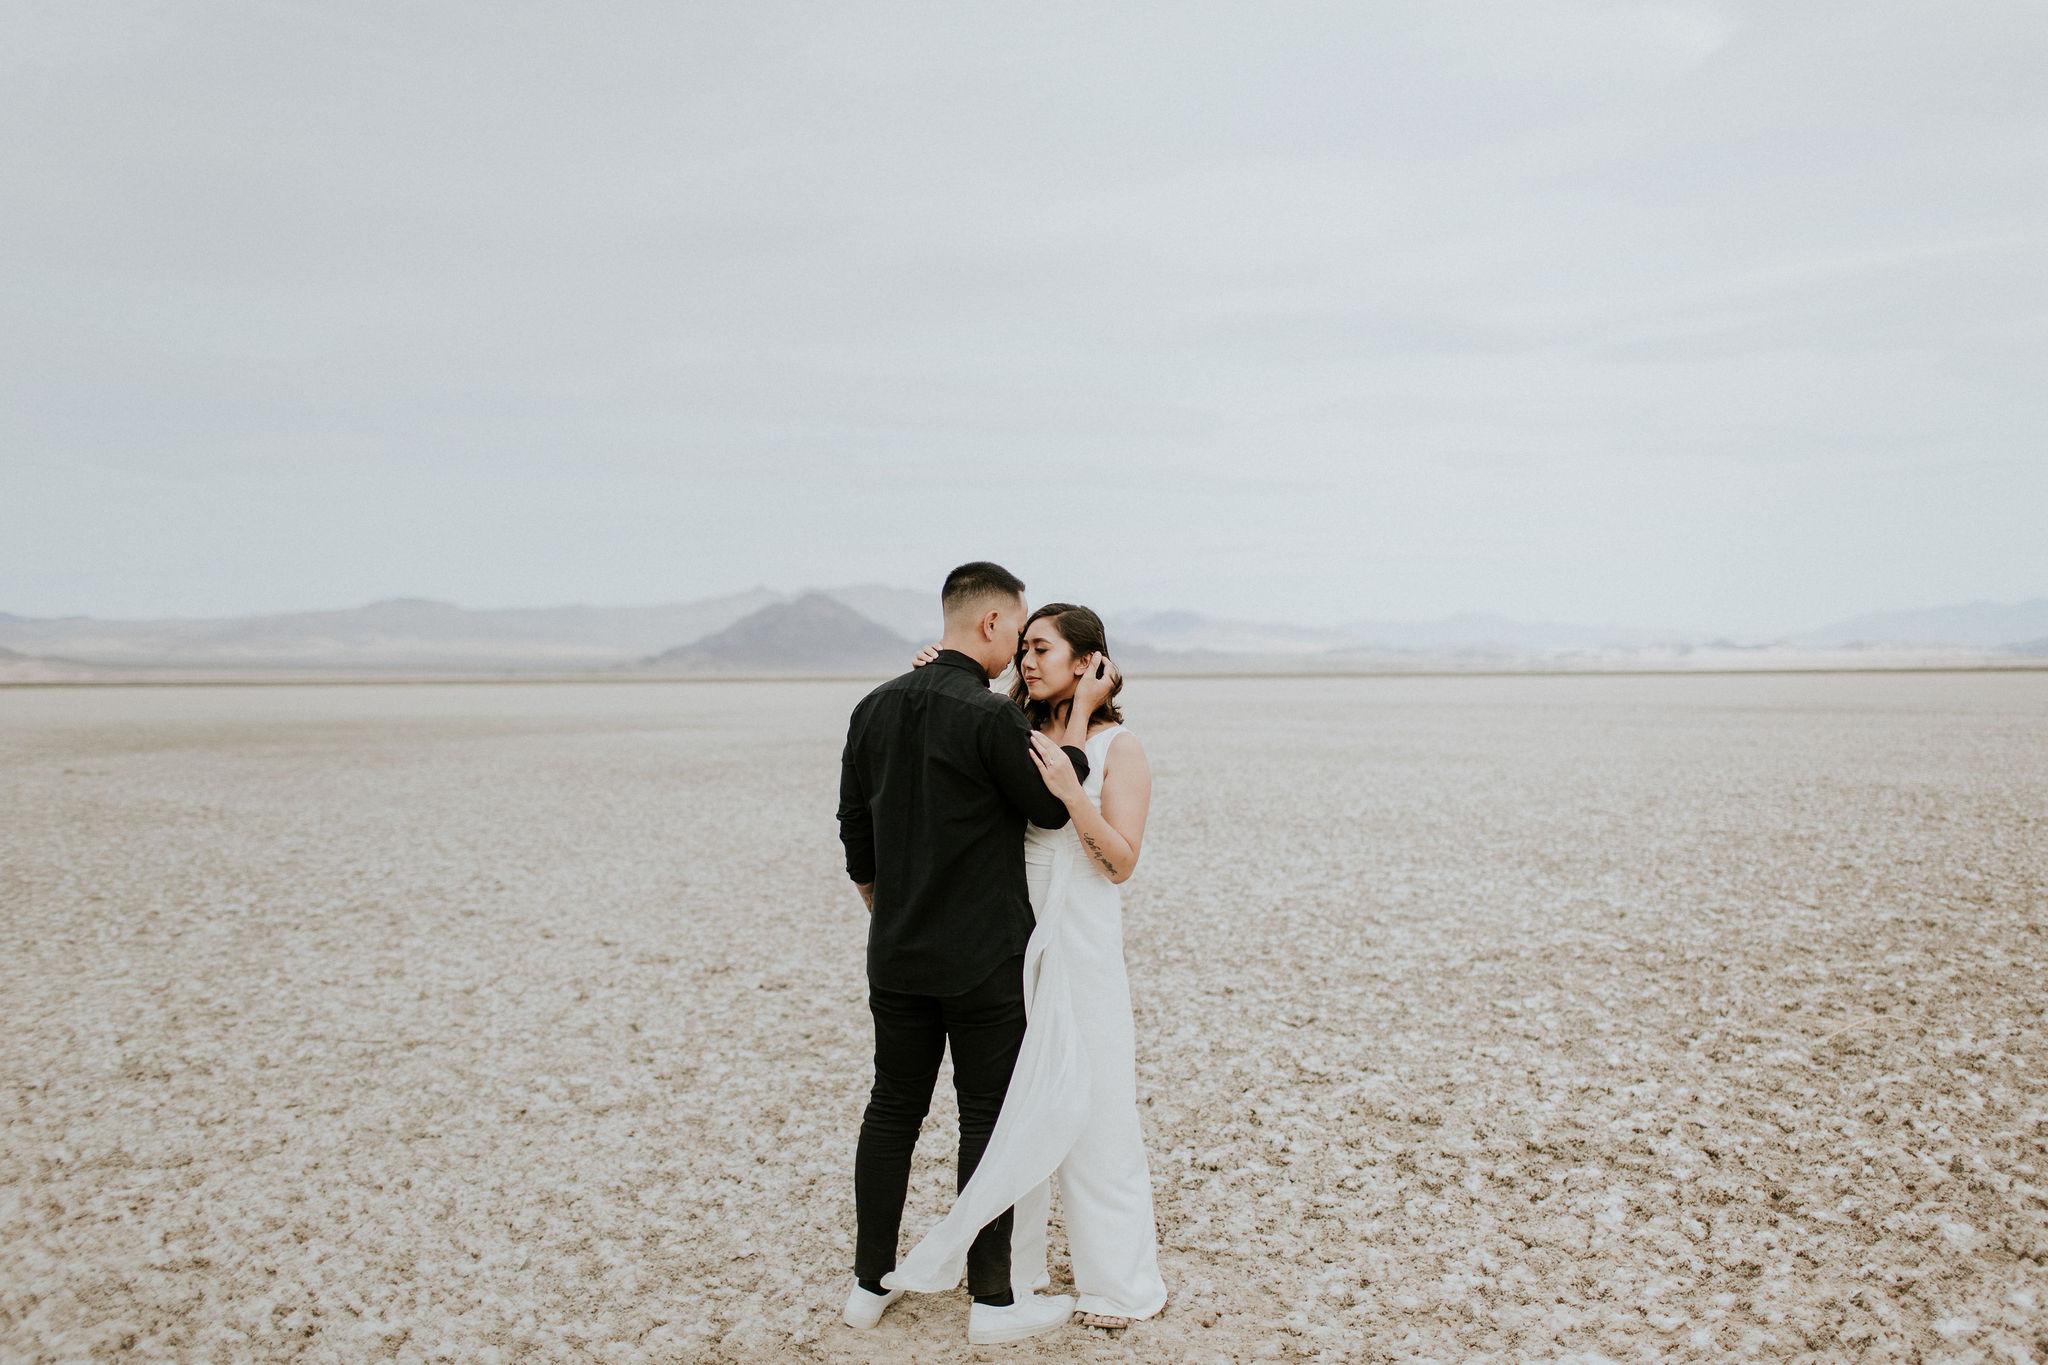 jamilaree-desert-engagementsession-11.jpg